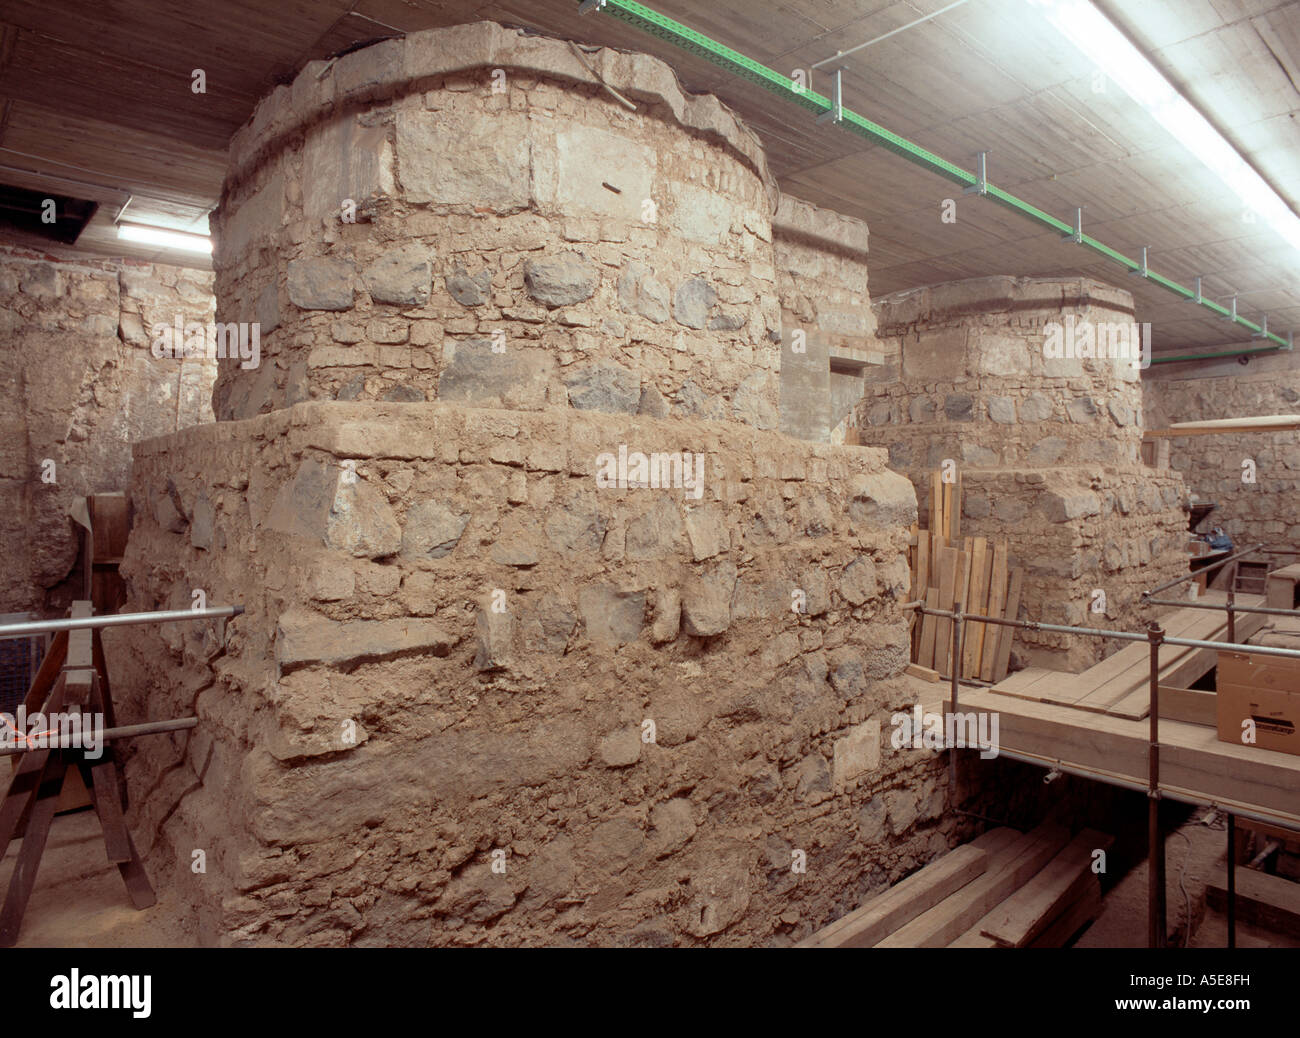 Koln Dom Ausgrabung Fundamente Der Pfeiler Stock Photo Alamy